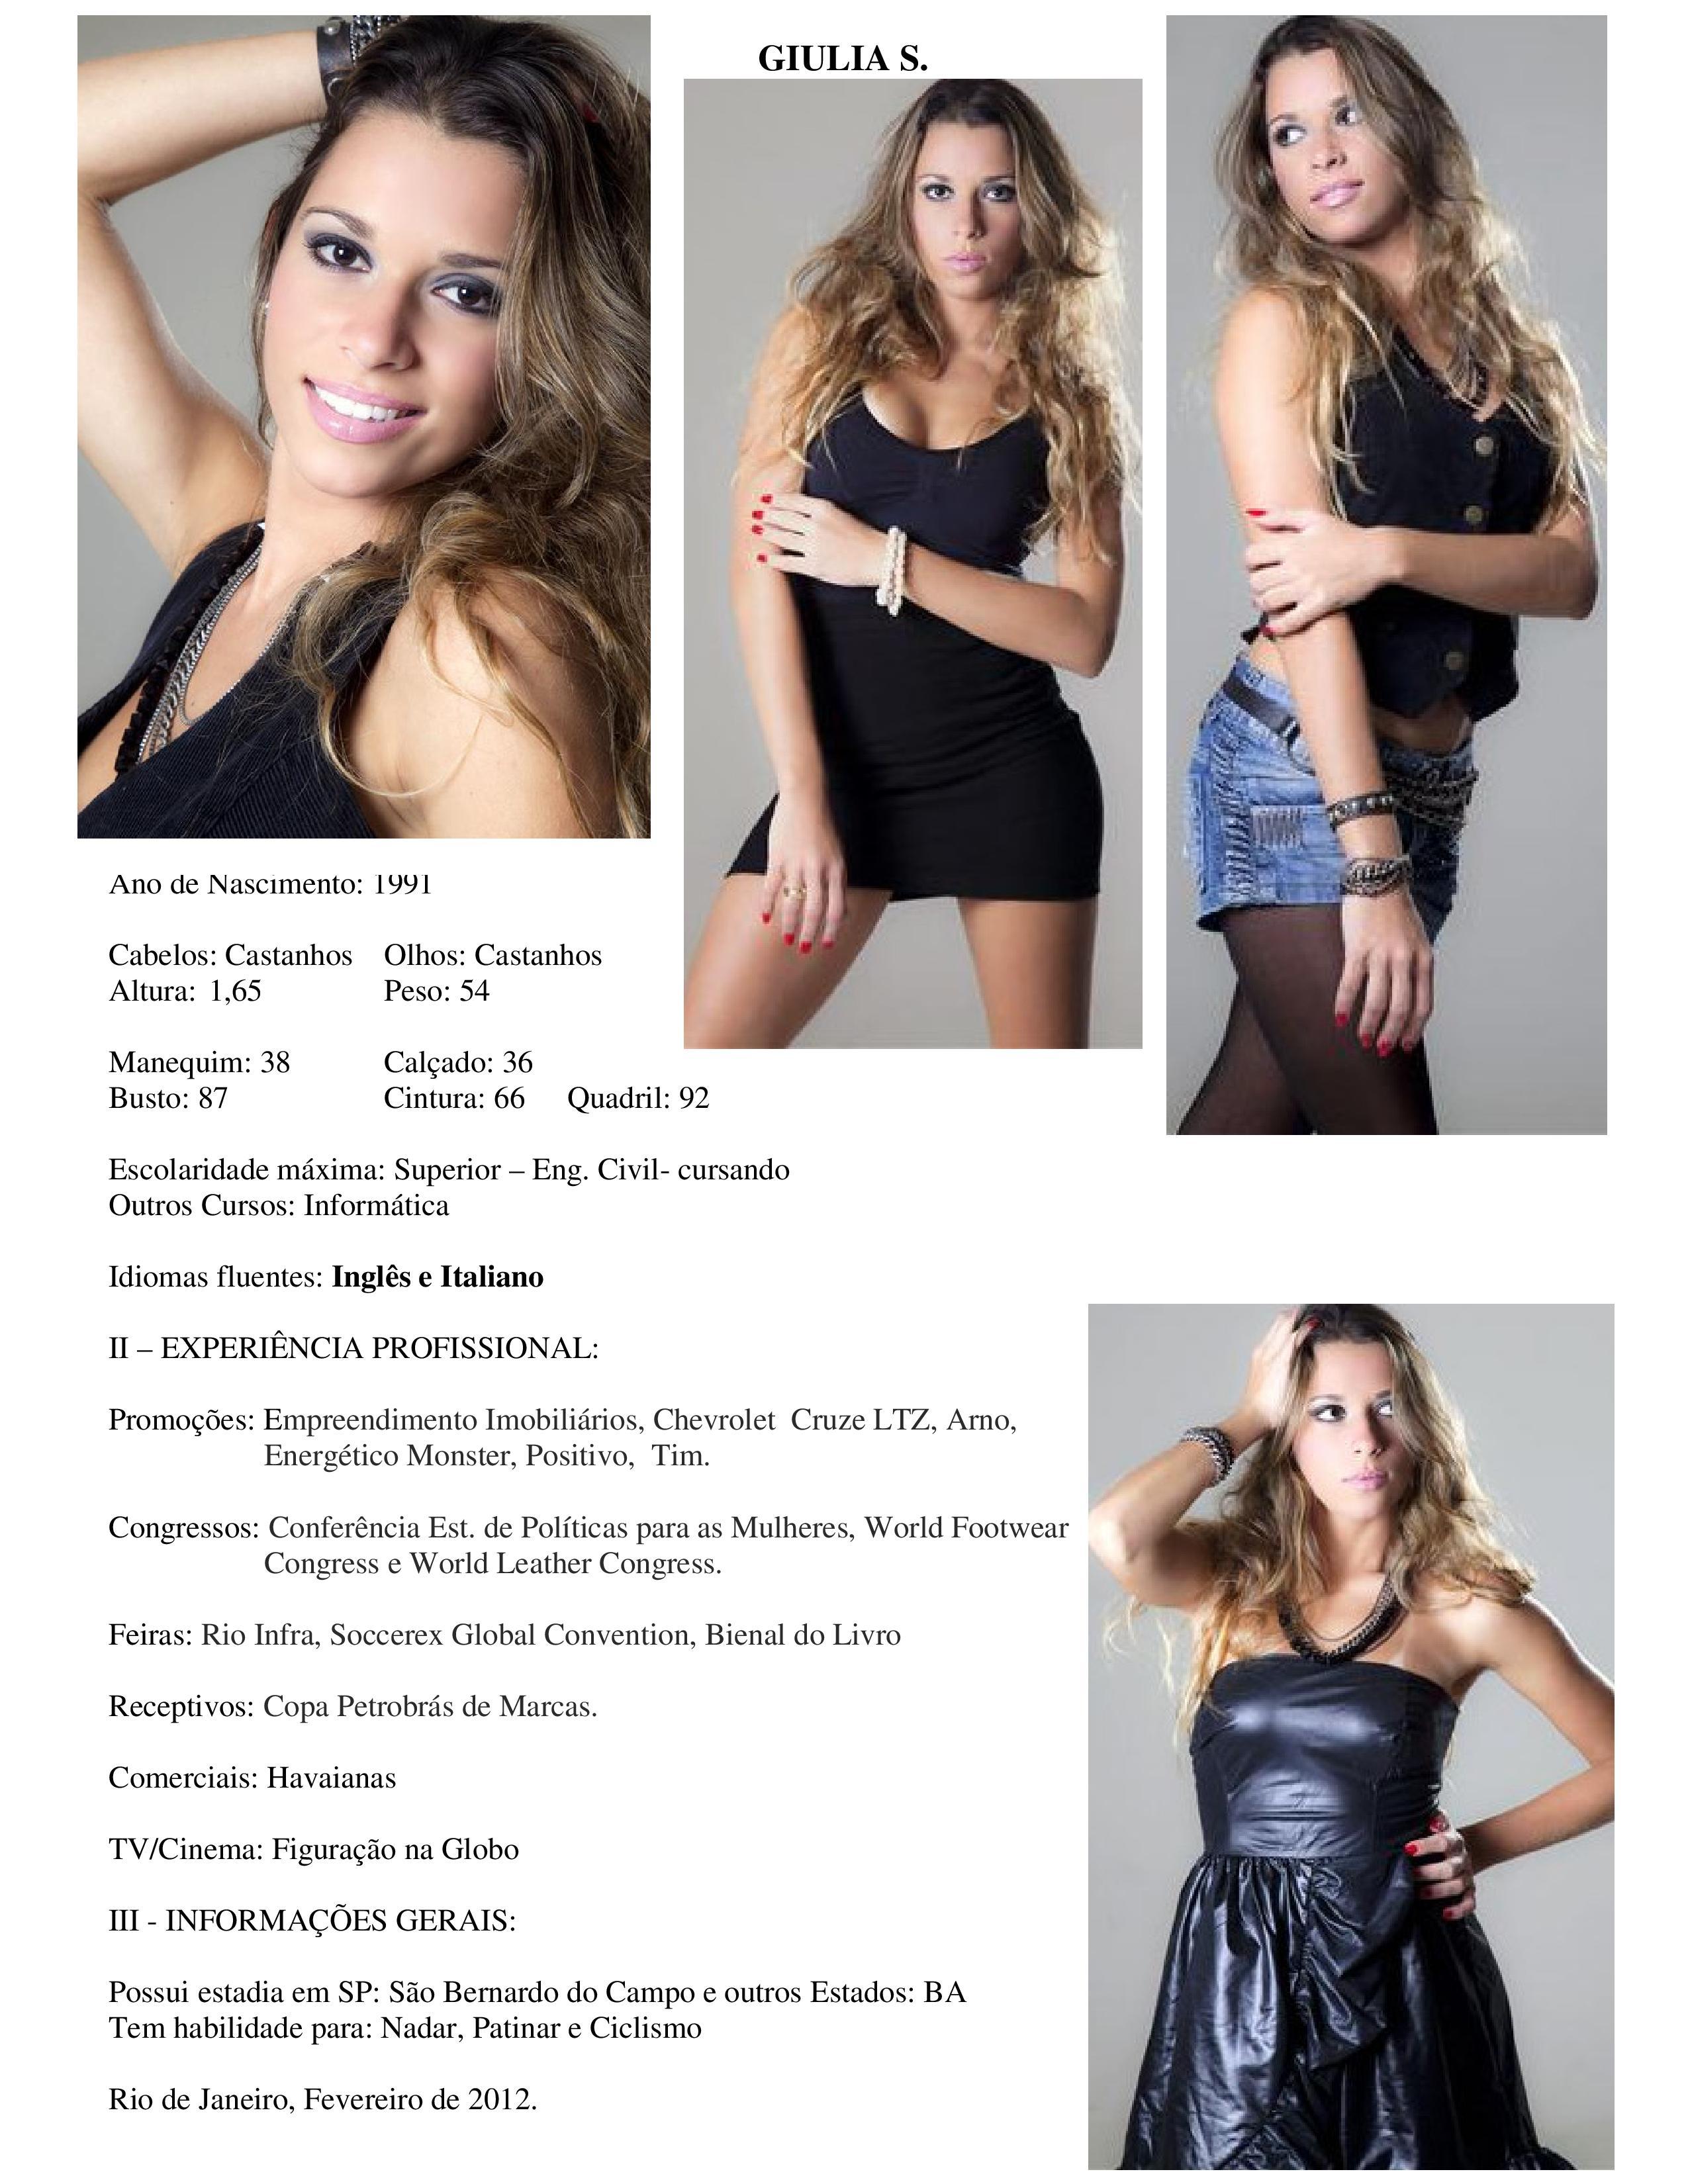 Giulia Stefania-page-001